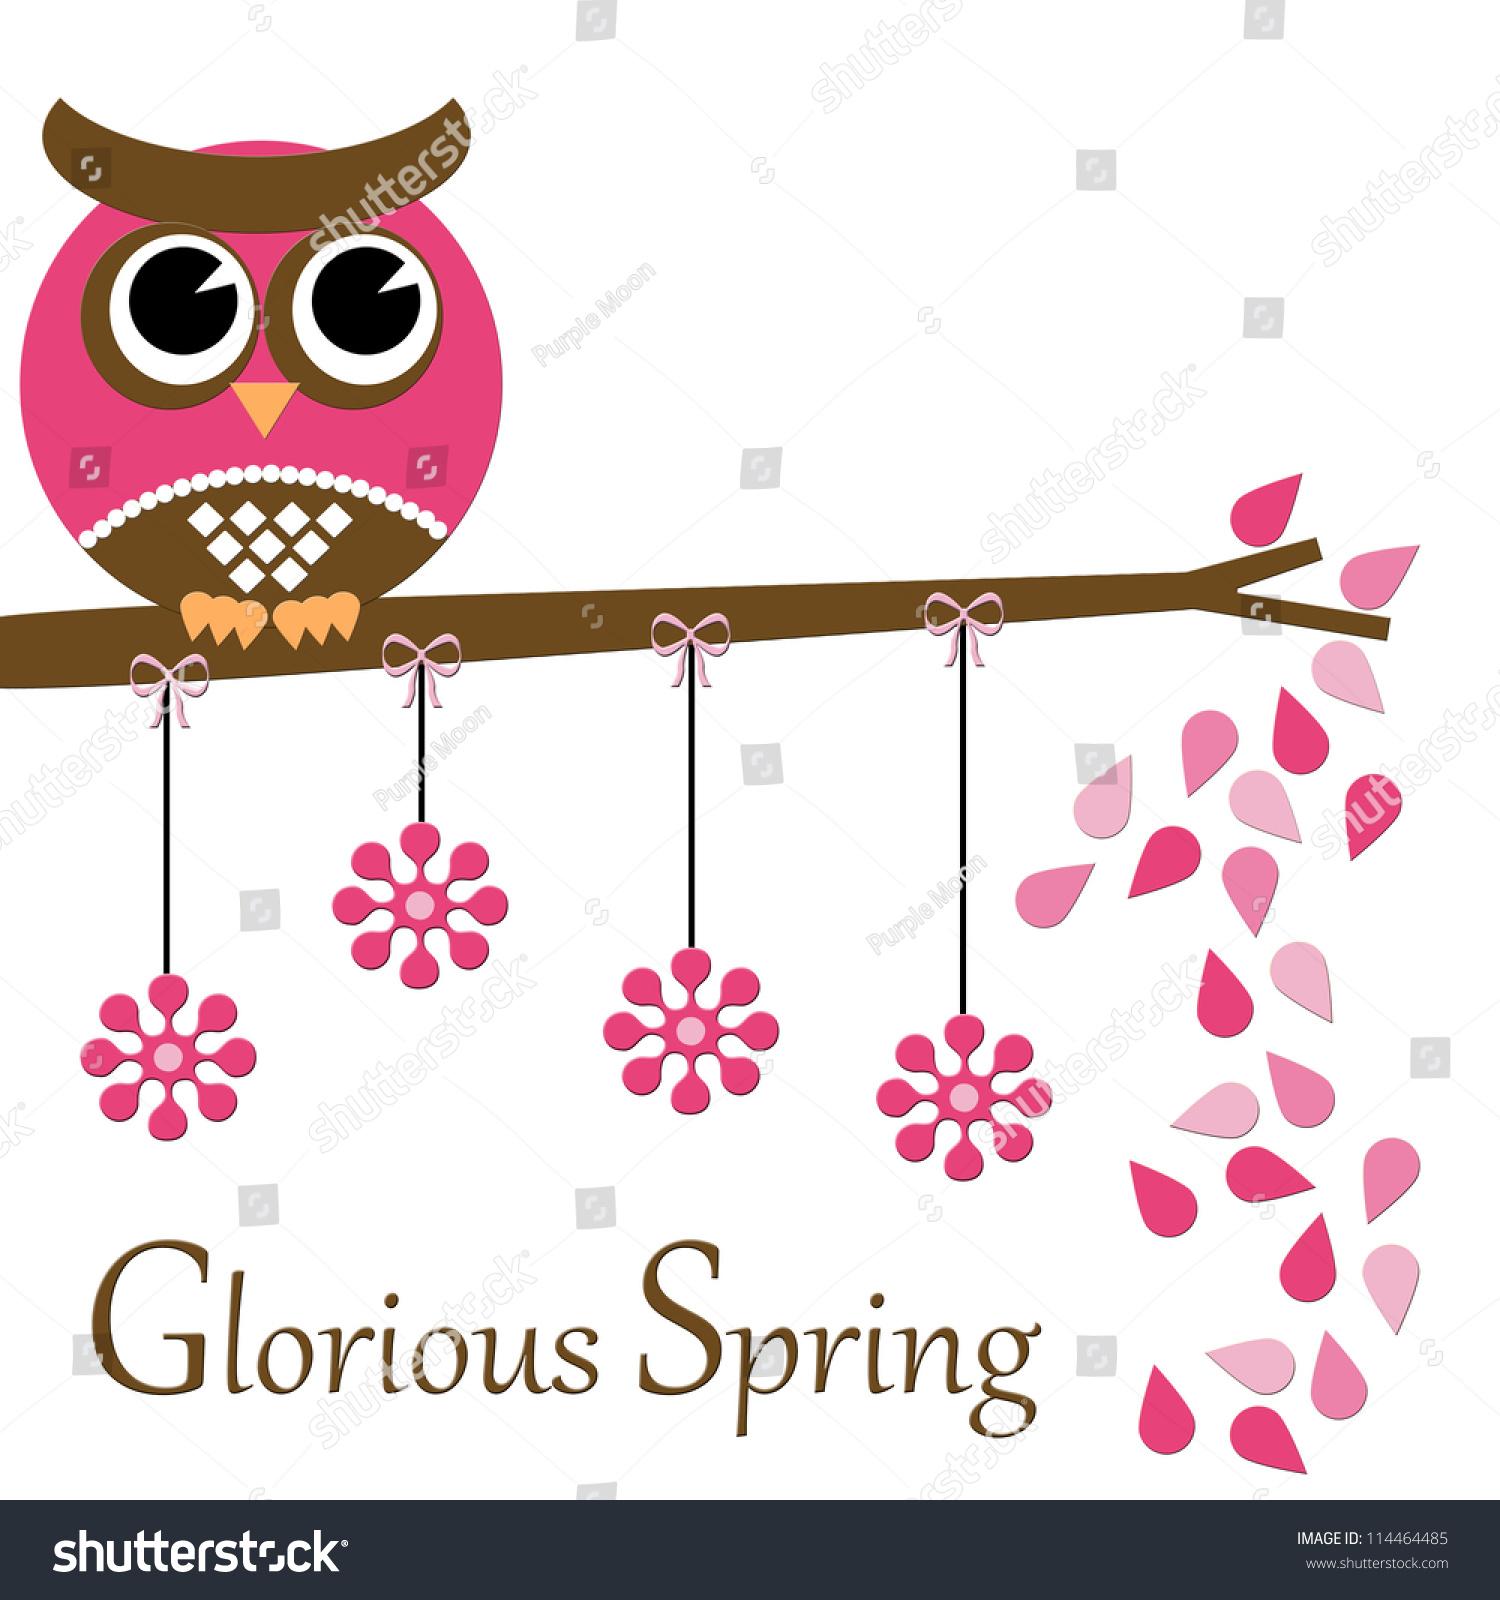 Glorious Spring Pink Owl Series Stock Illustration ...